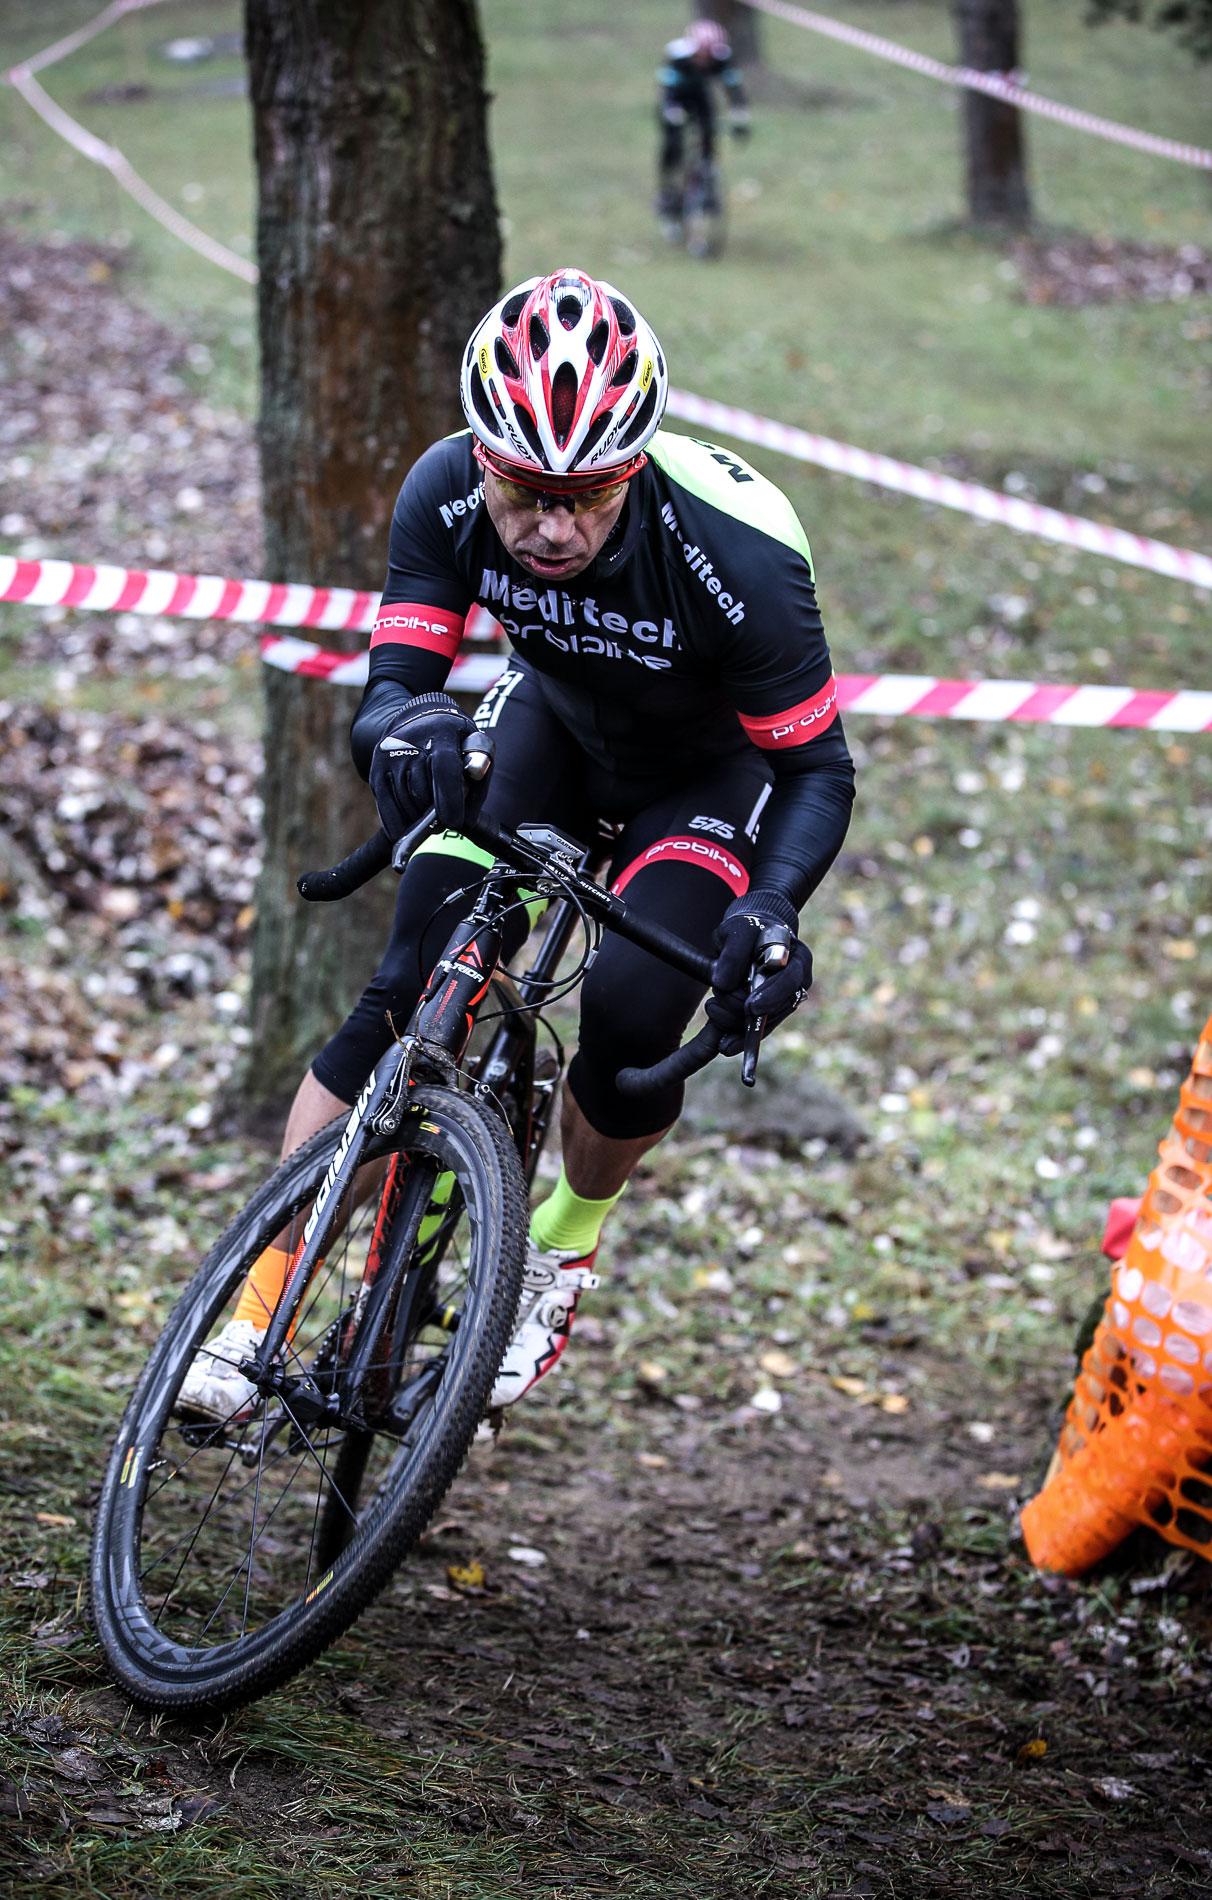 KolorCross Cyclocross Magyar Kupa, Kazincbarcika, szintek